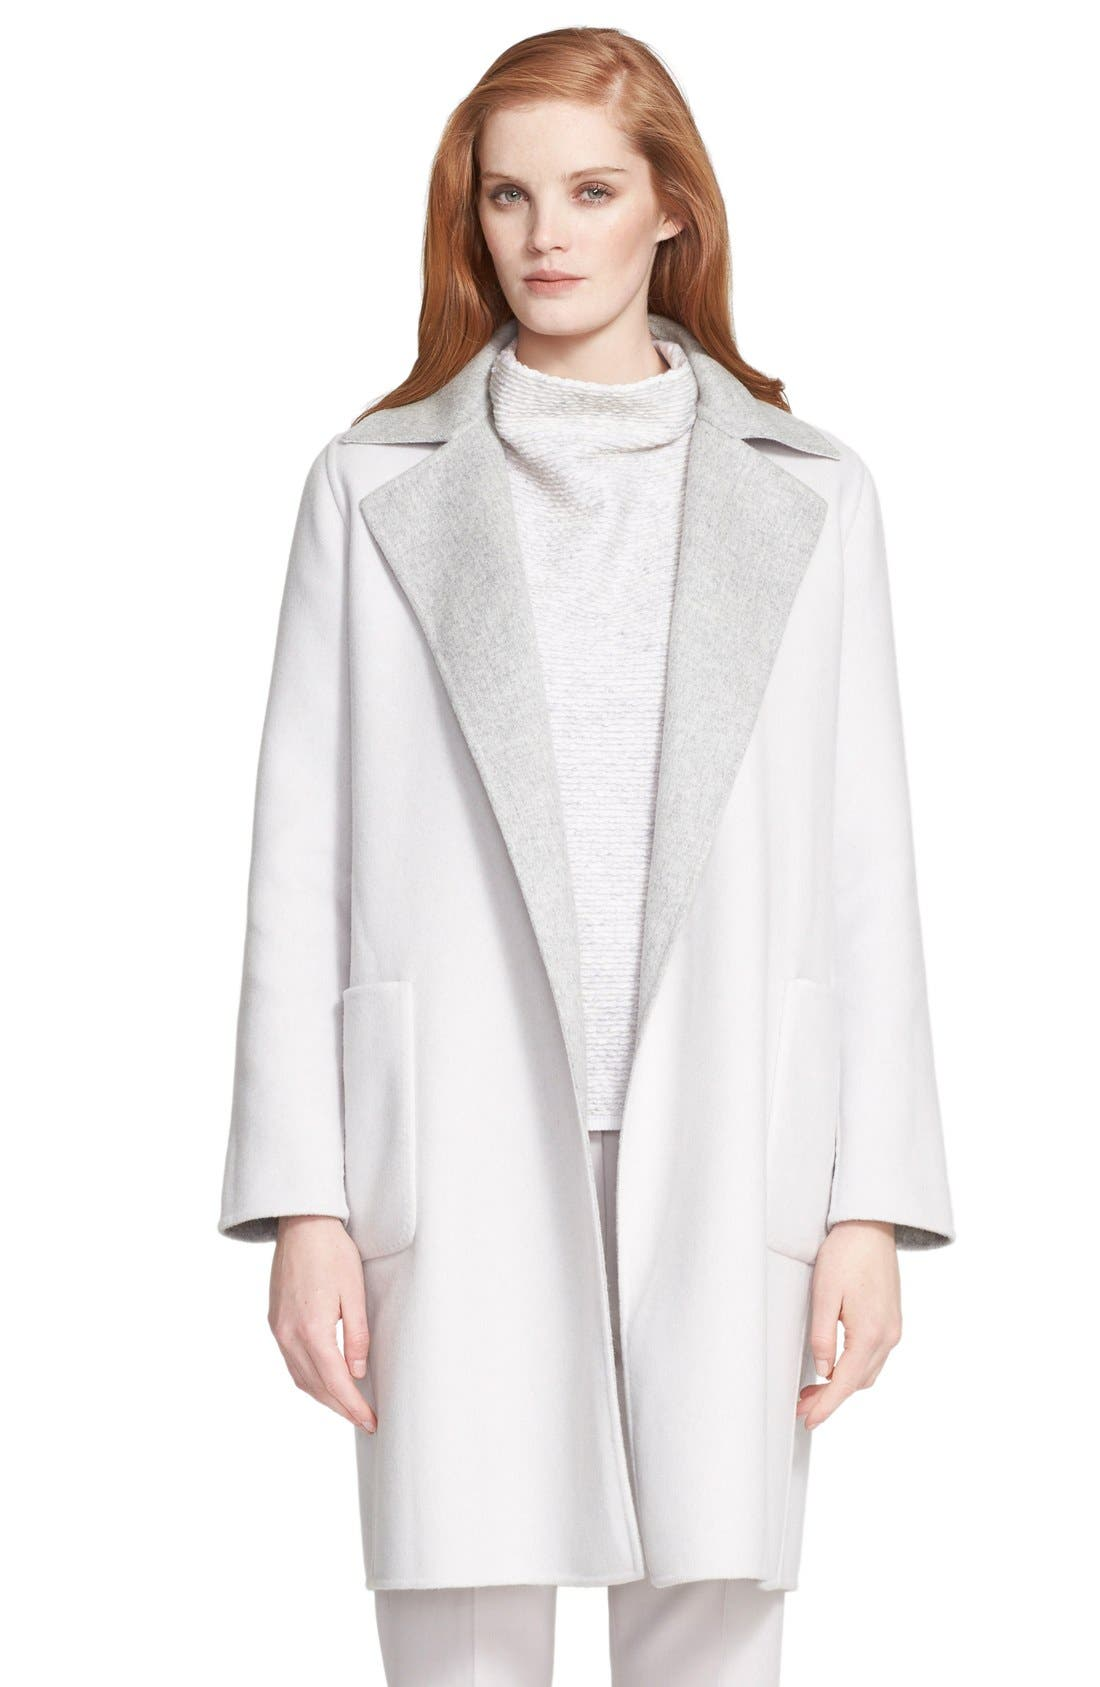 Main Image - Max Mara 'Visone' Reversible Wool & Angora Wrap Coat with Belt